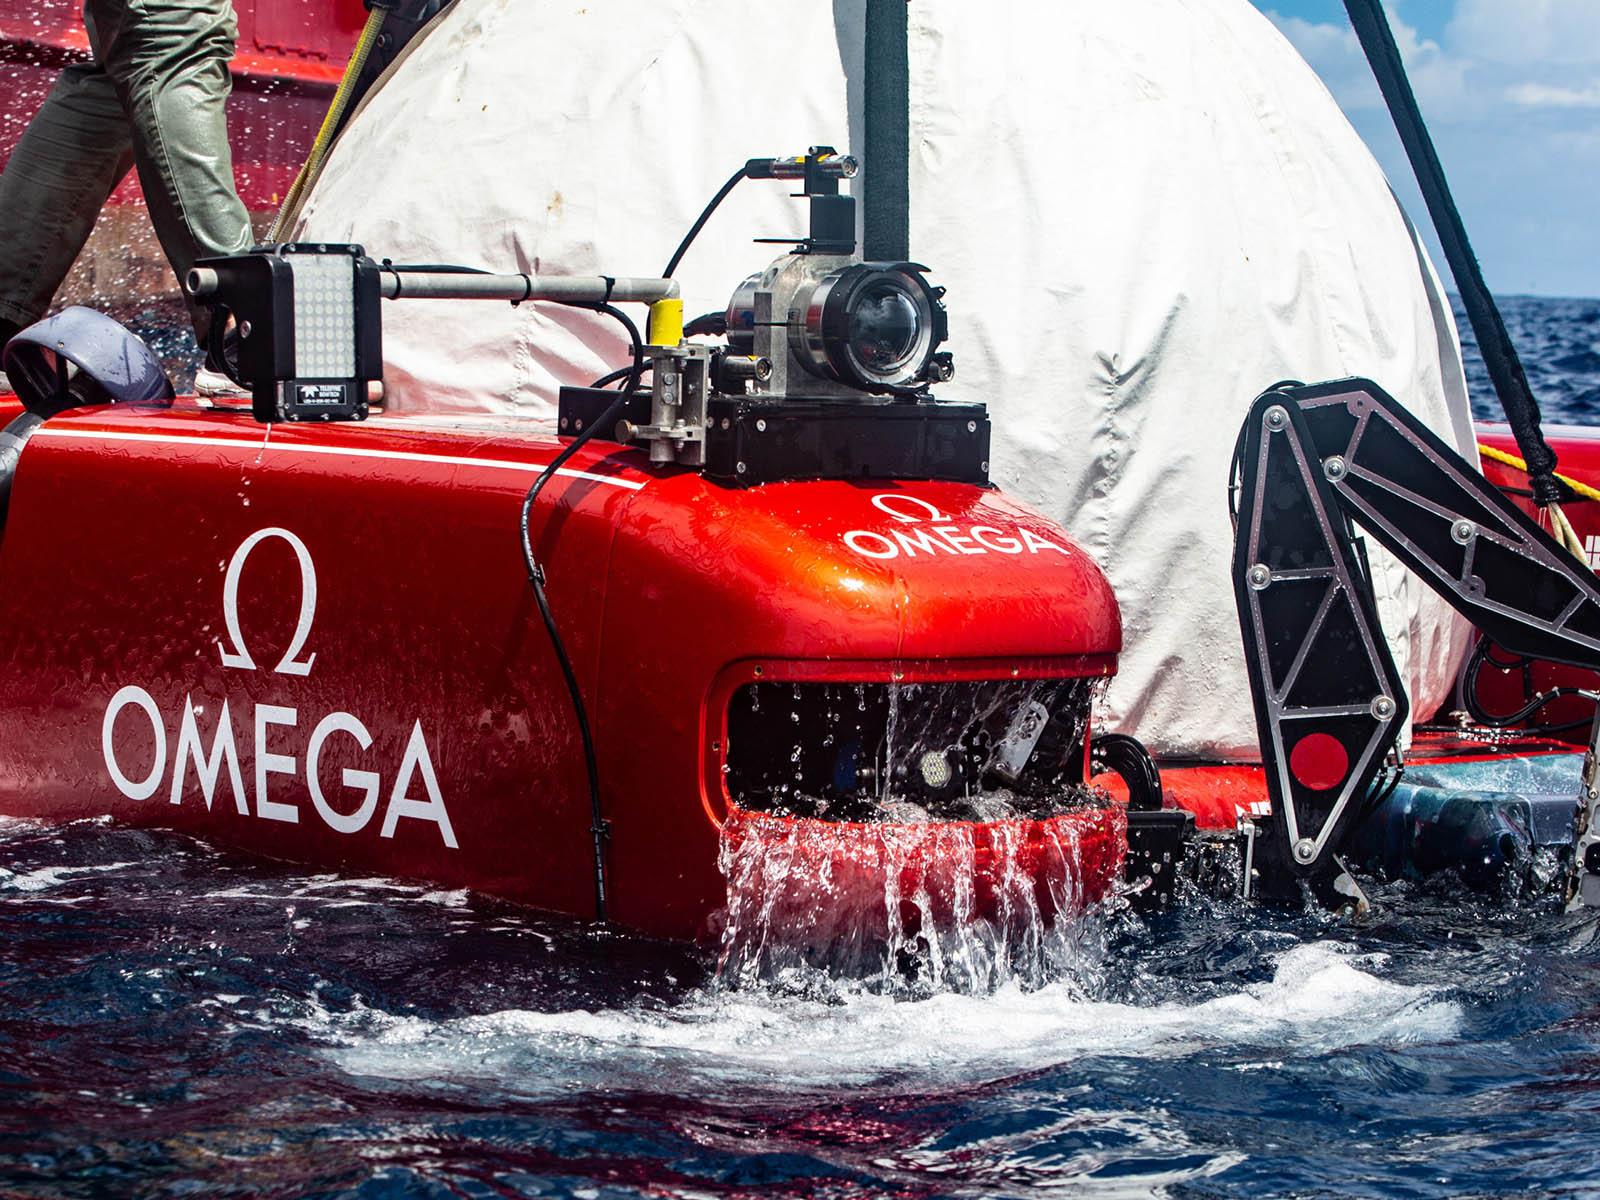 omega-seamaster-diver-300m-nekton-edition-5.jpg